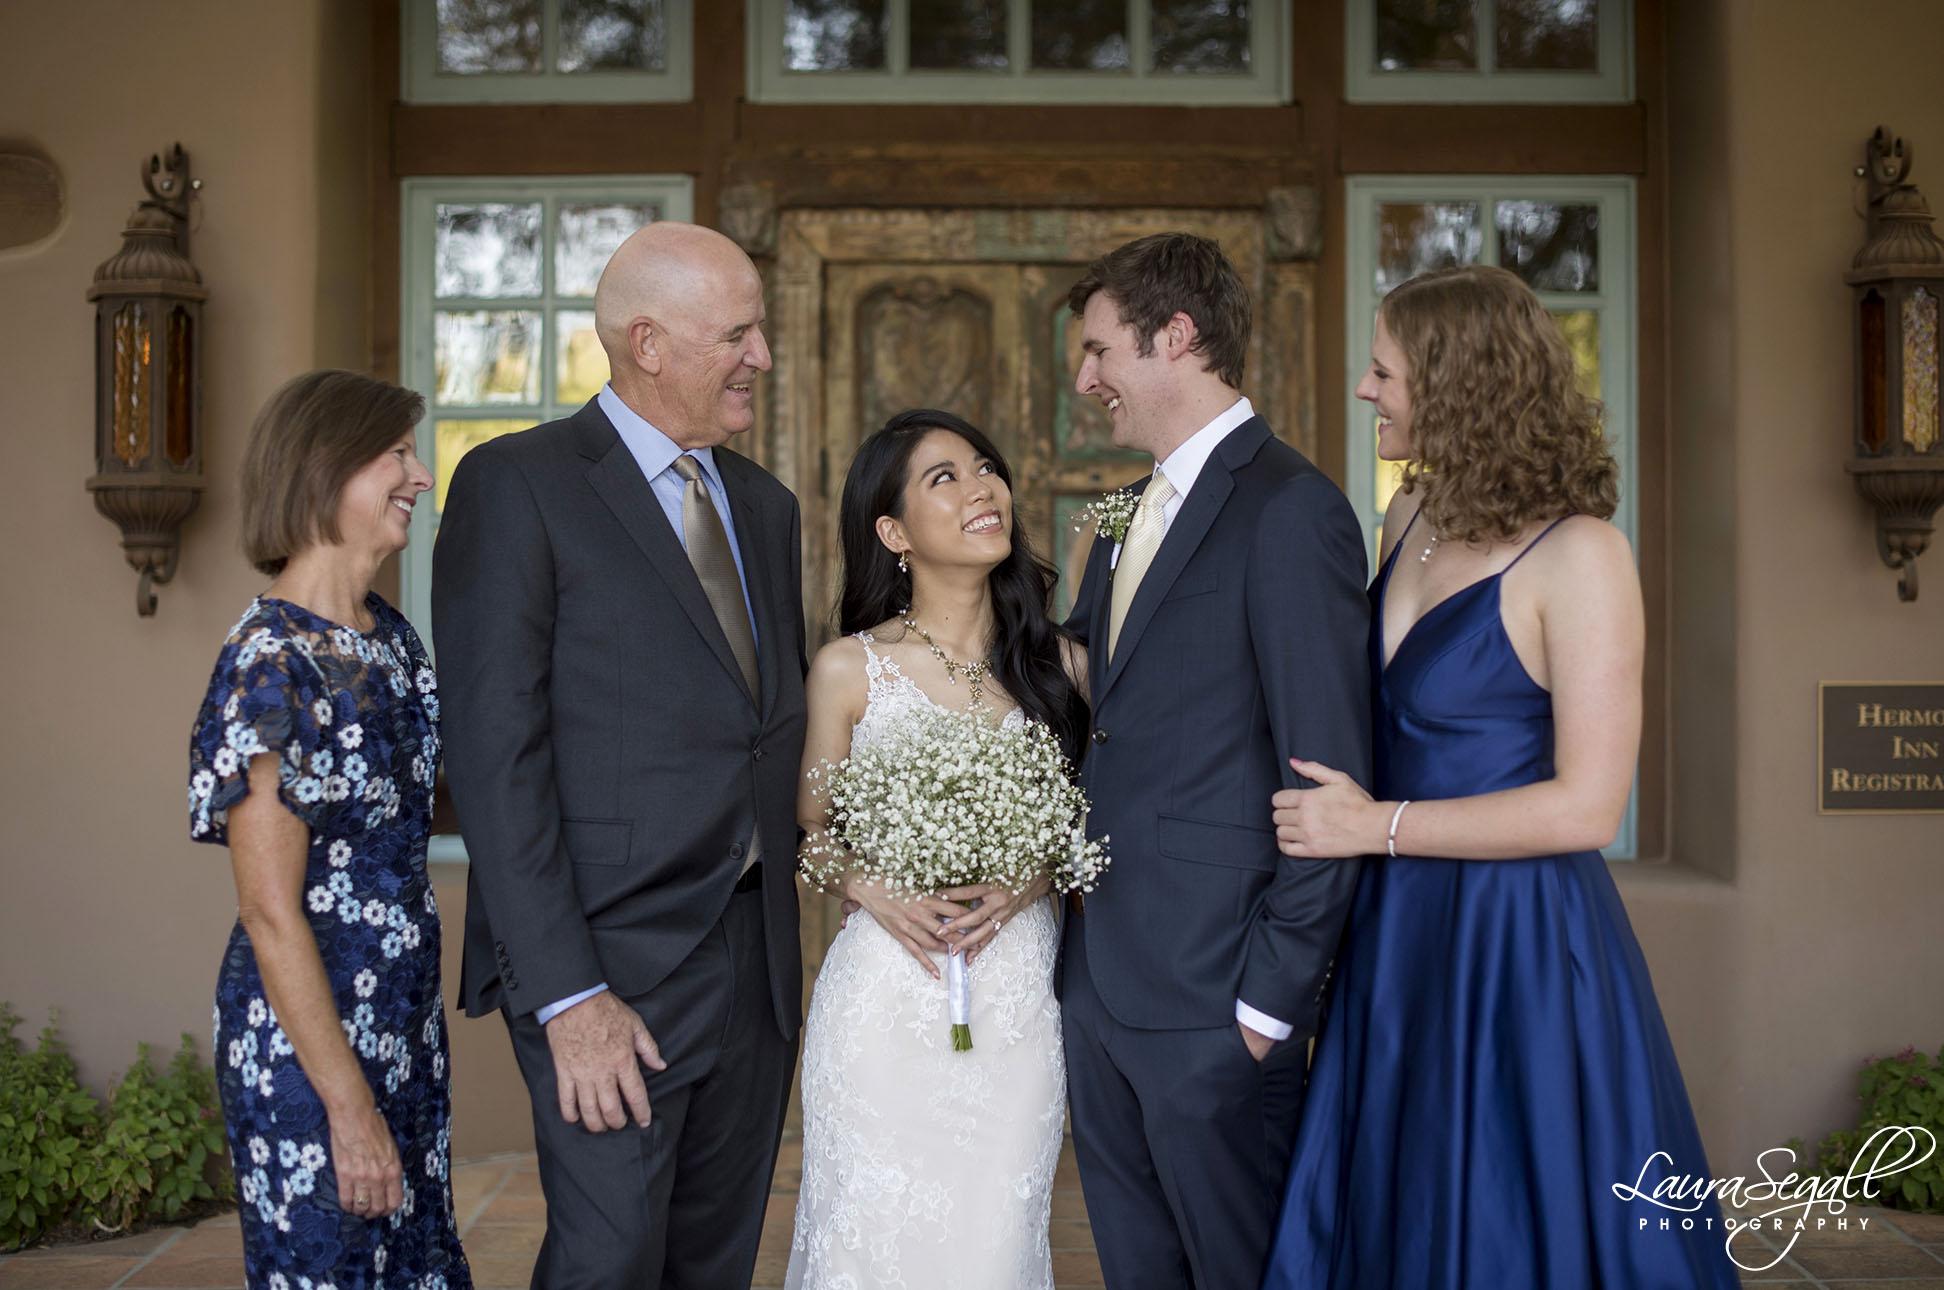 The Hermosa Inn wedding photographer